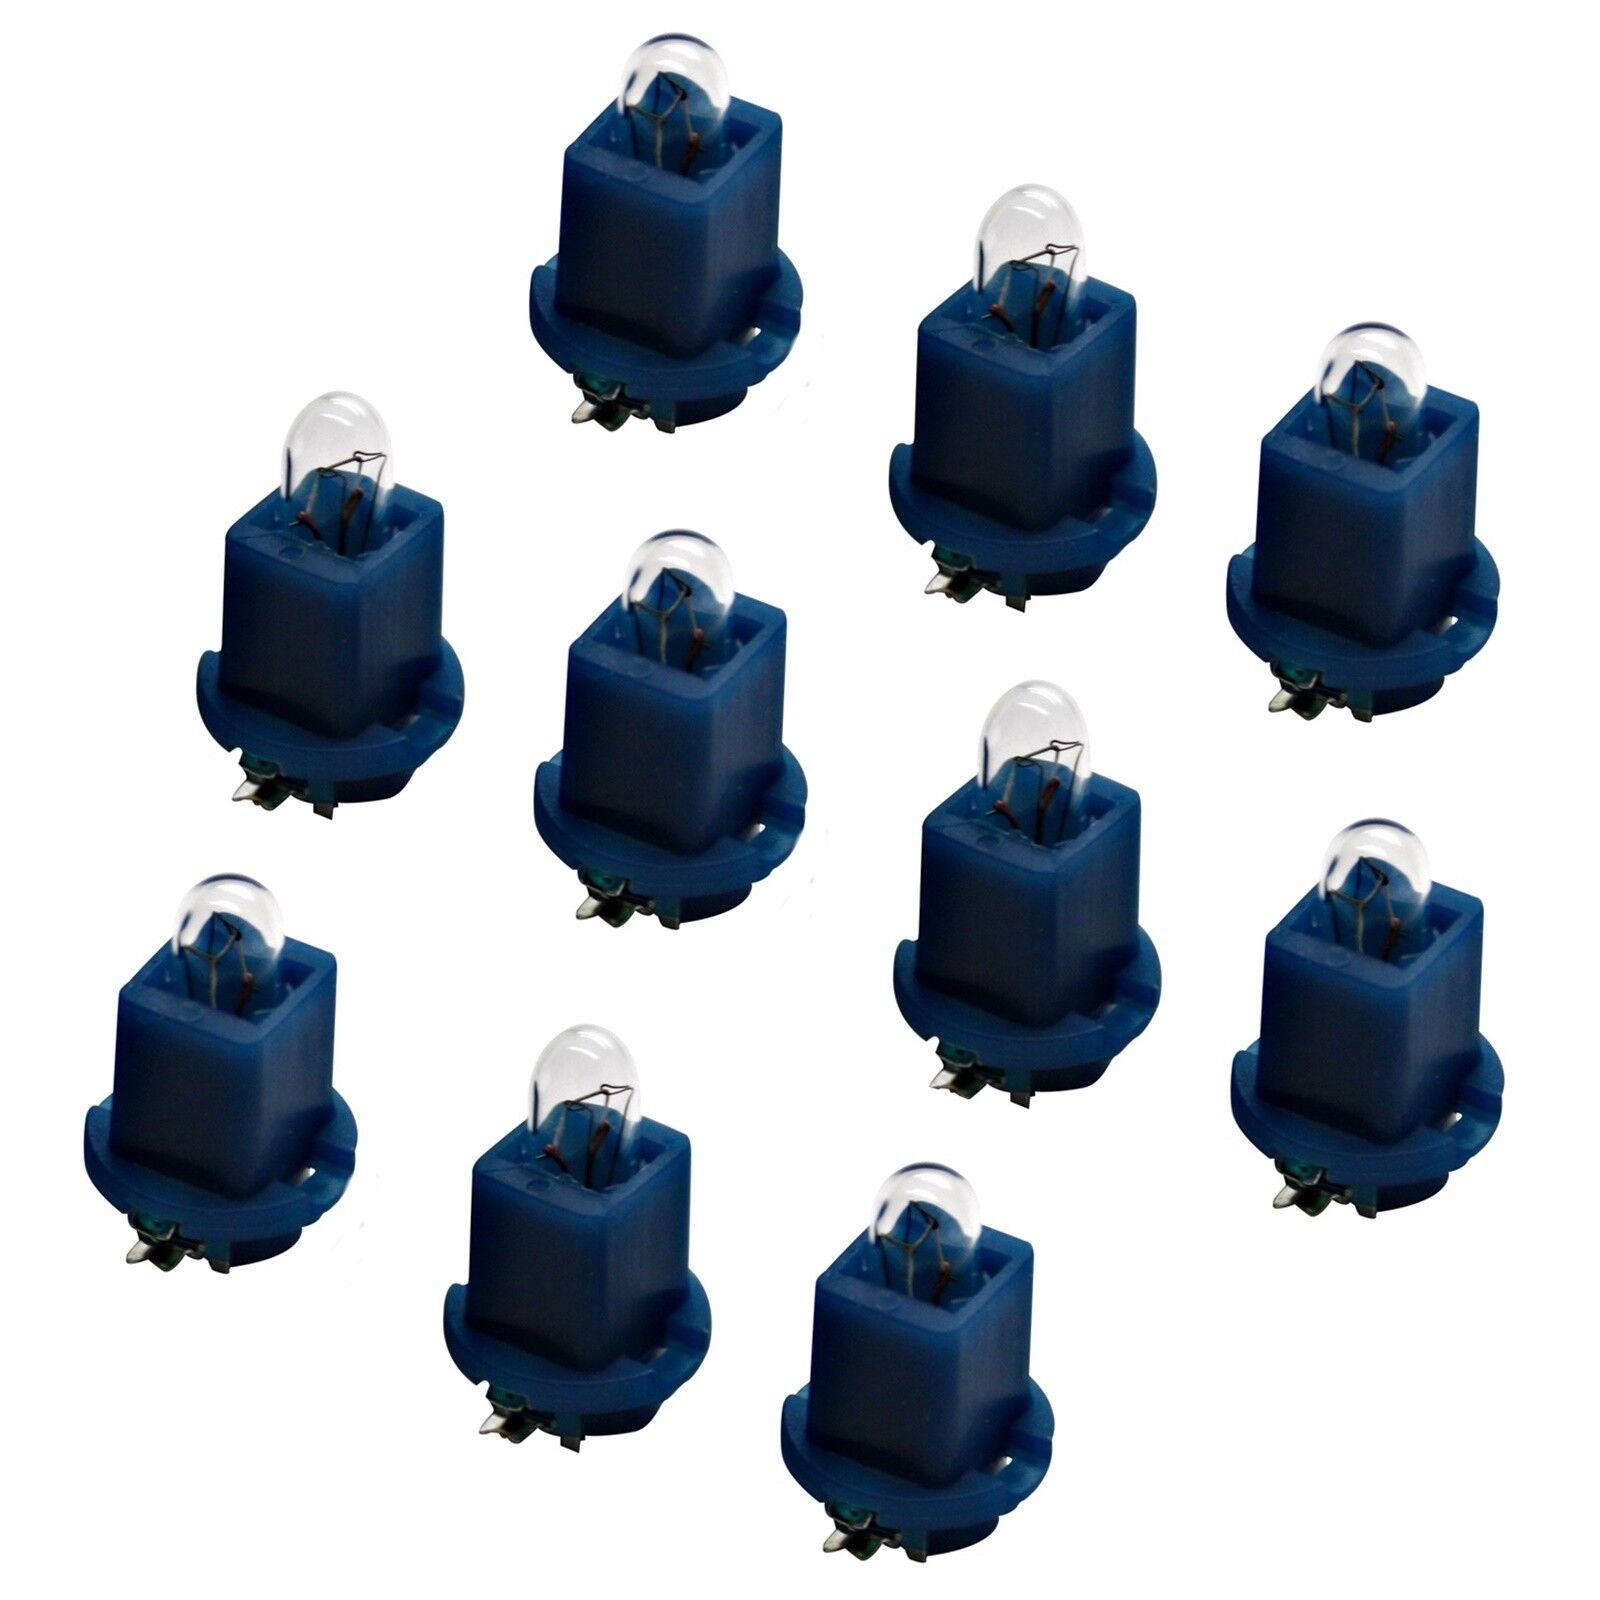 Halogen Bulb Speedometer Led's Instrument Lighting 1,8W Ebs R4 DB21 12 Volt